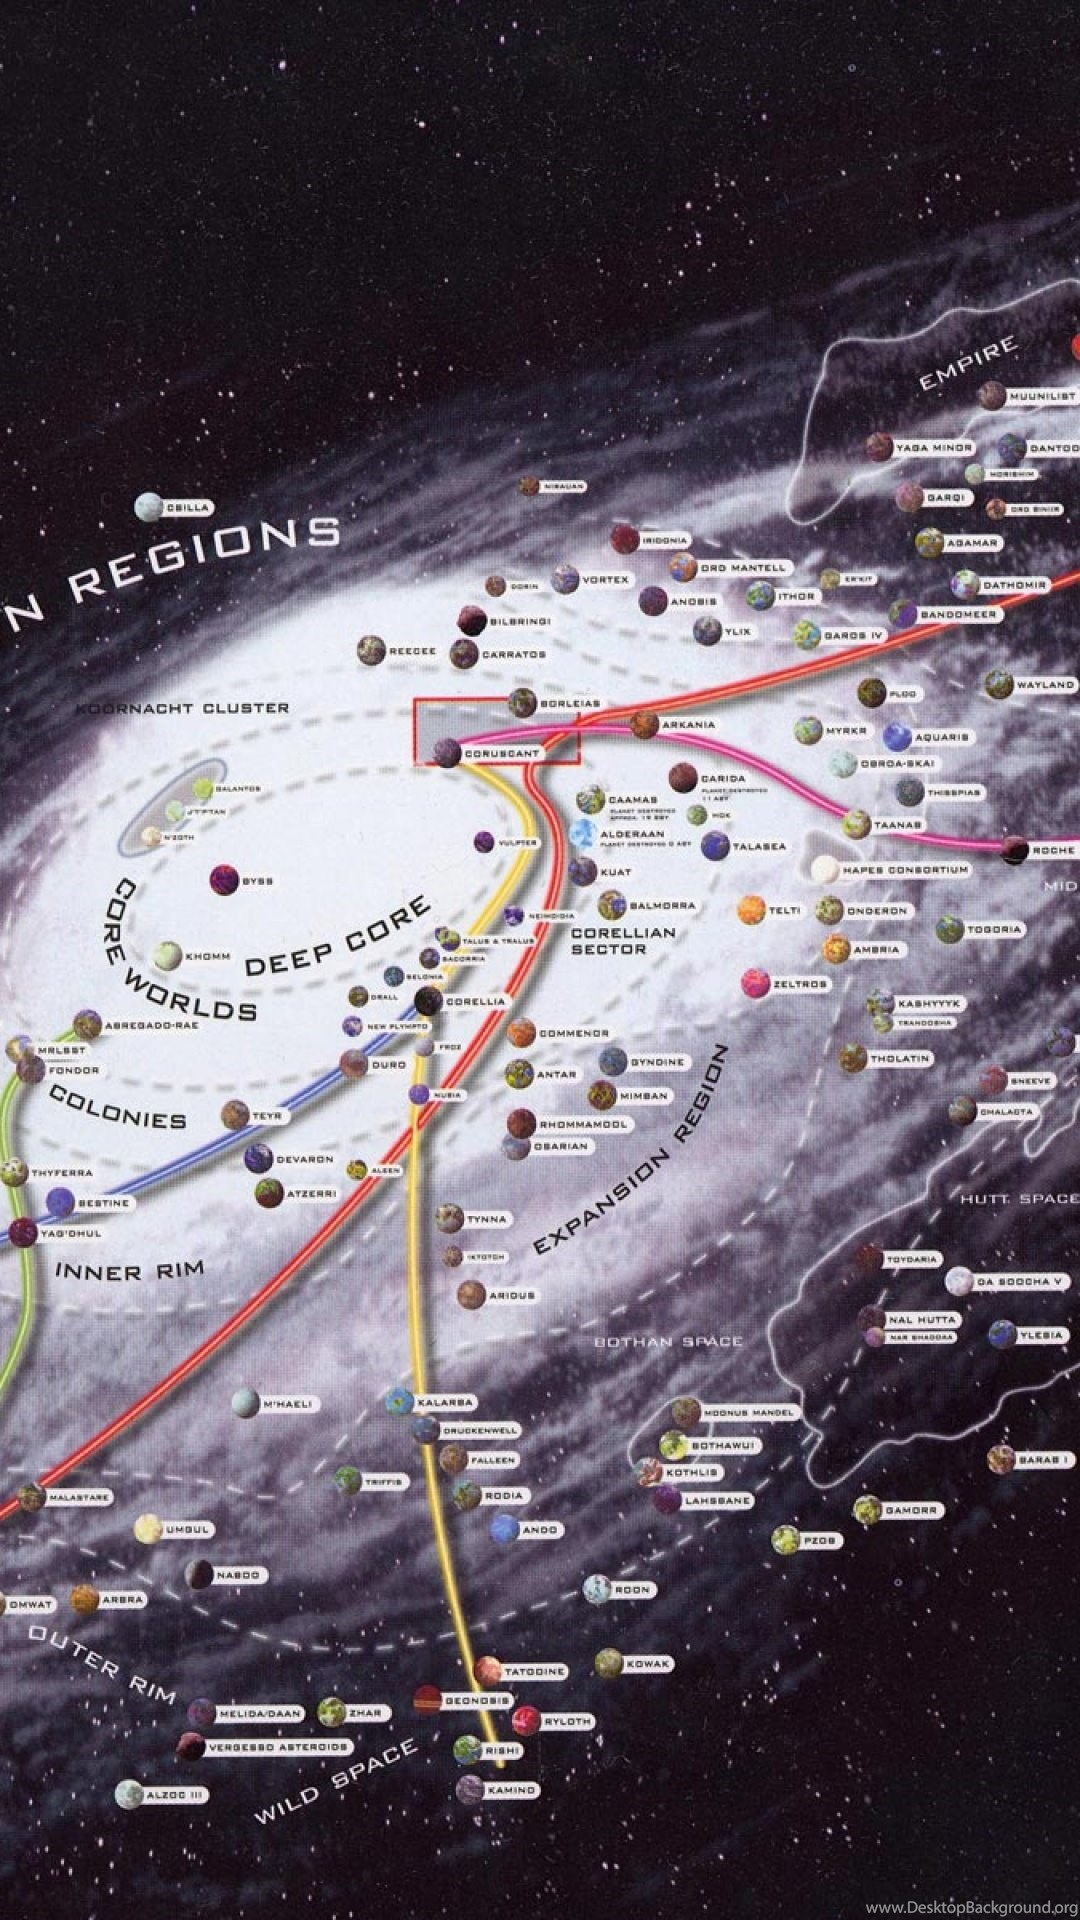 Star Wars Galaxy Map Iphone 5 Wallpapers Desktop Background